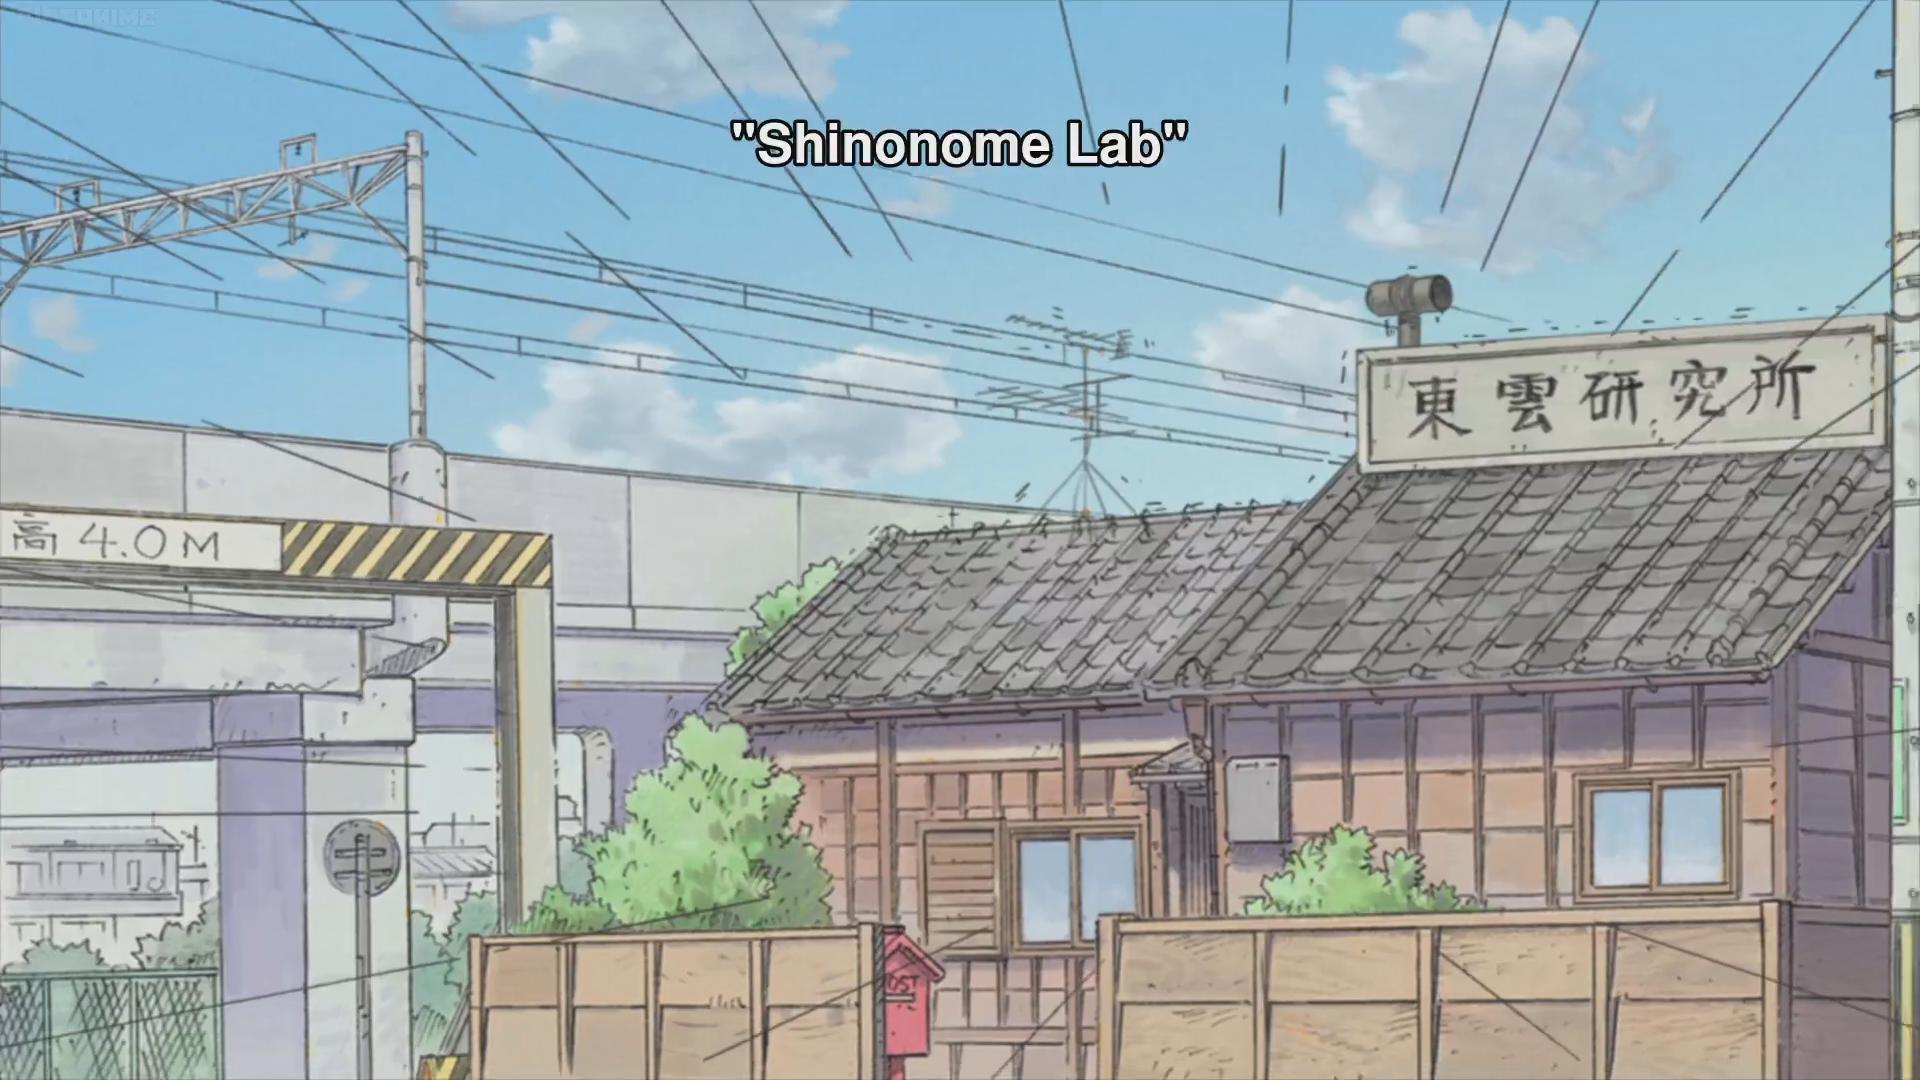 Anime Explosion Sound 8